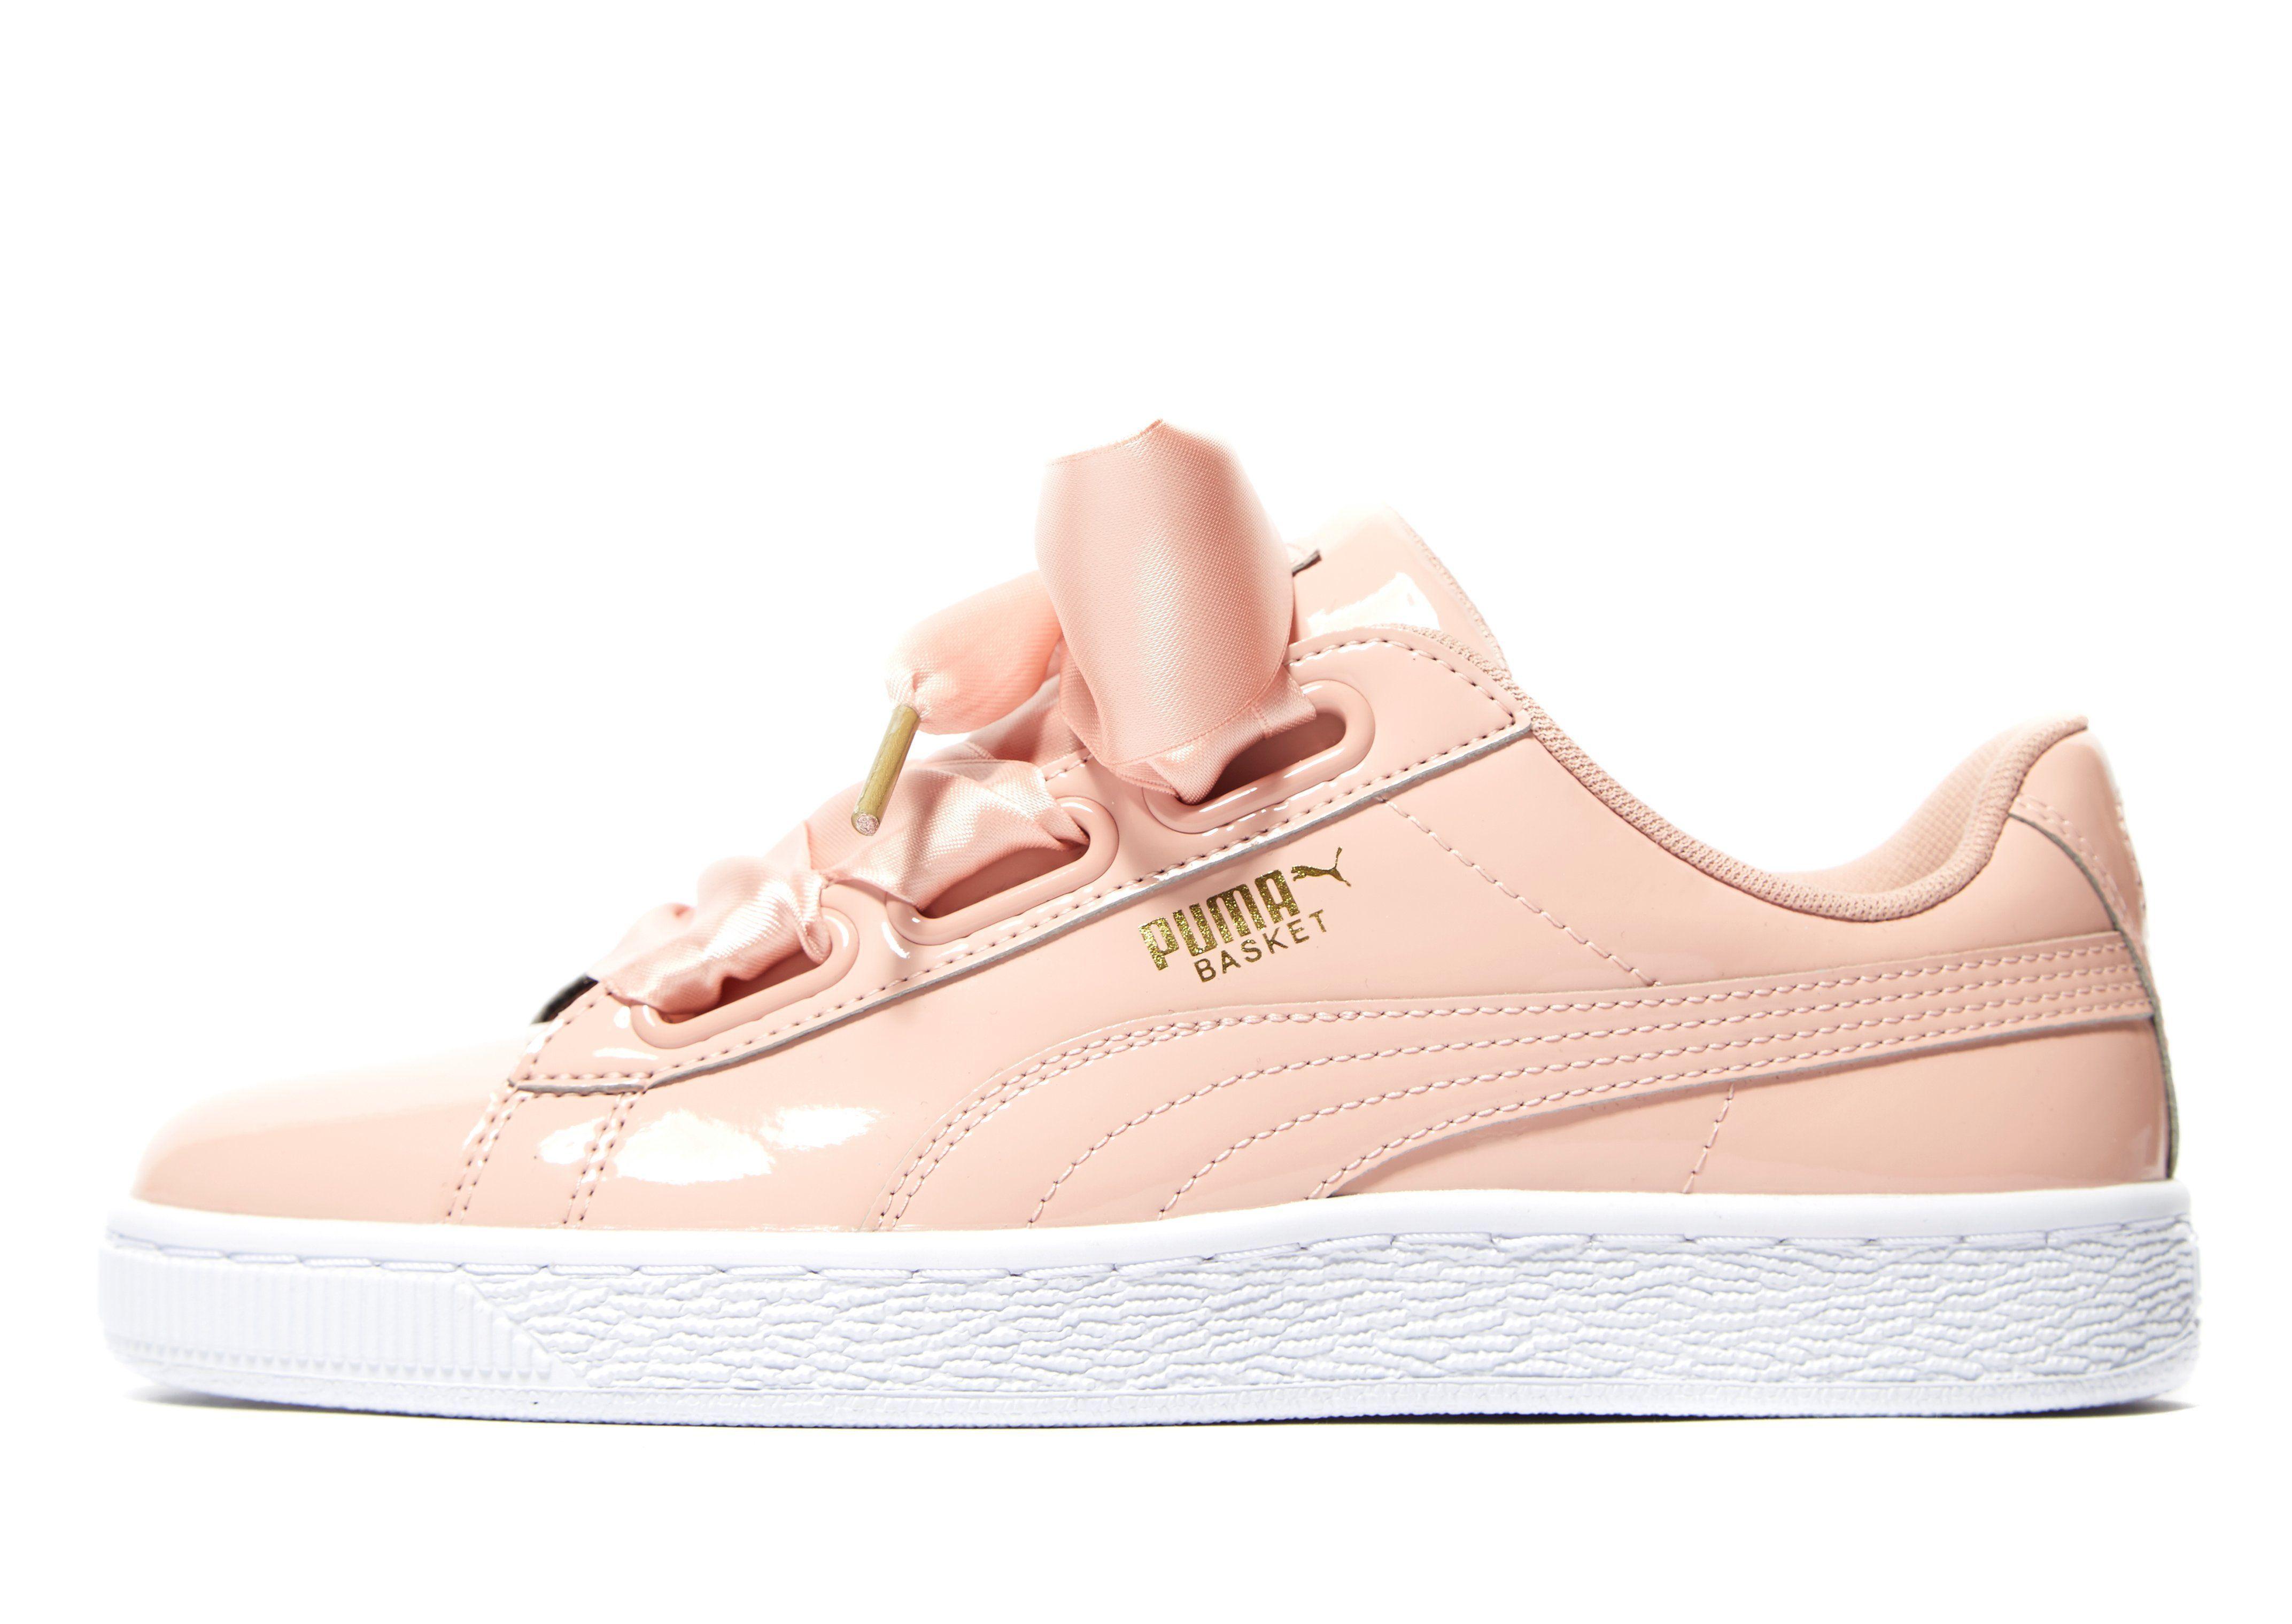 low priced f104e 1e41c PUMA Basket Heart Patent Women's | shopping - shoes | Puma ...